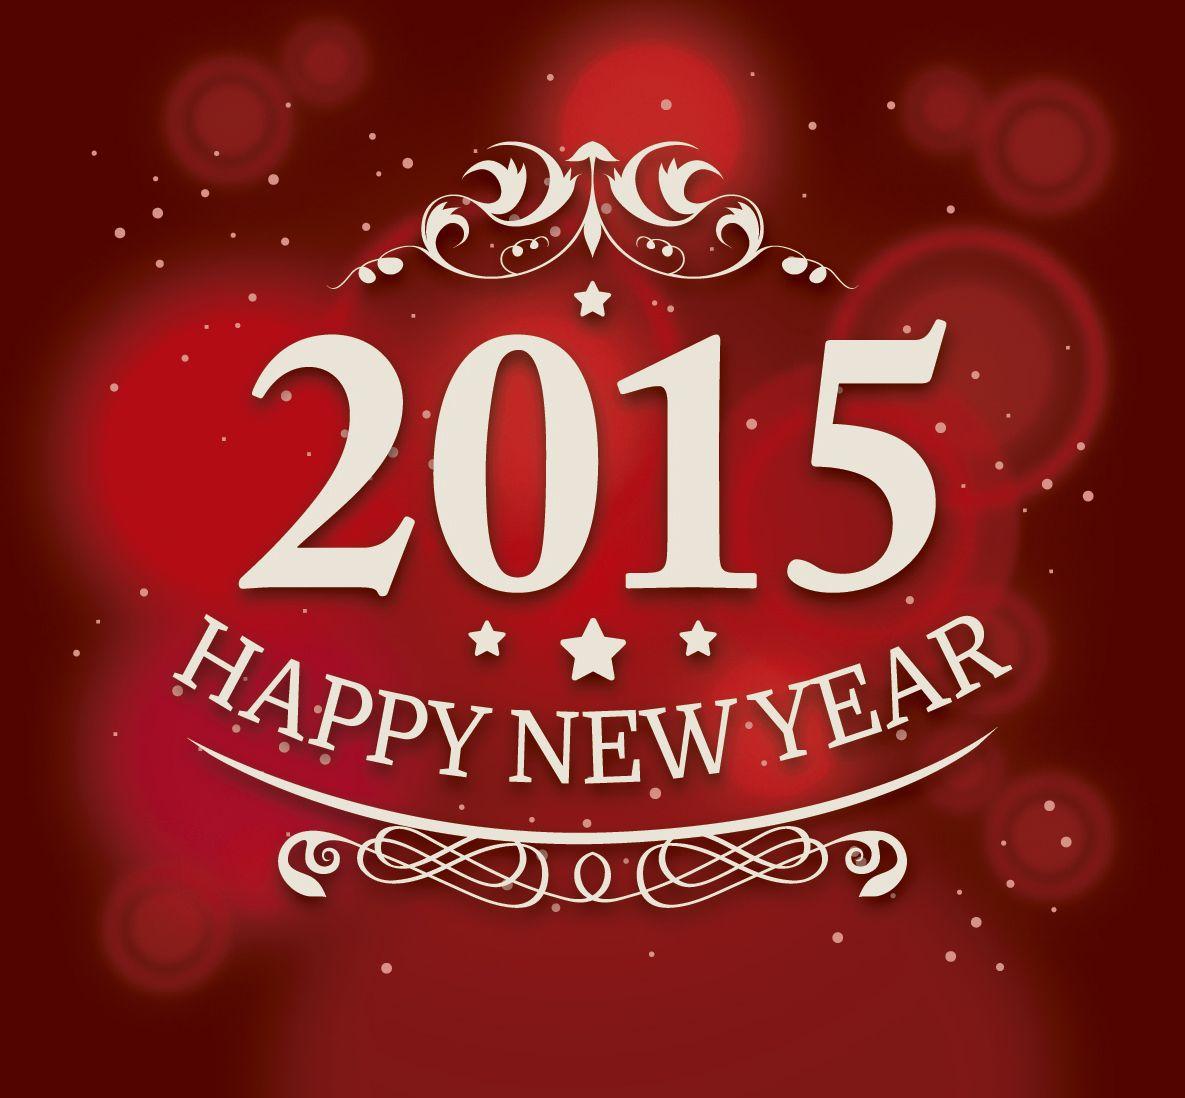 Happy New Year 2015 Red Swirls Design Greeting Download Happy New